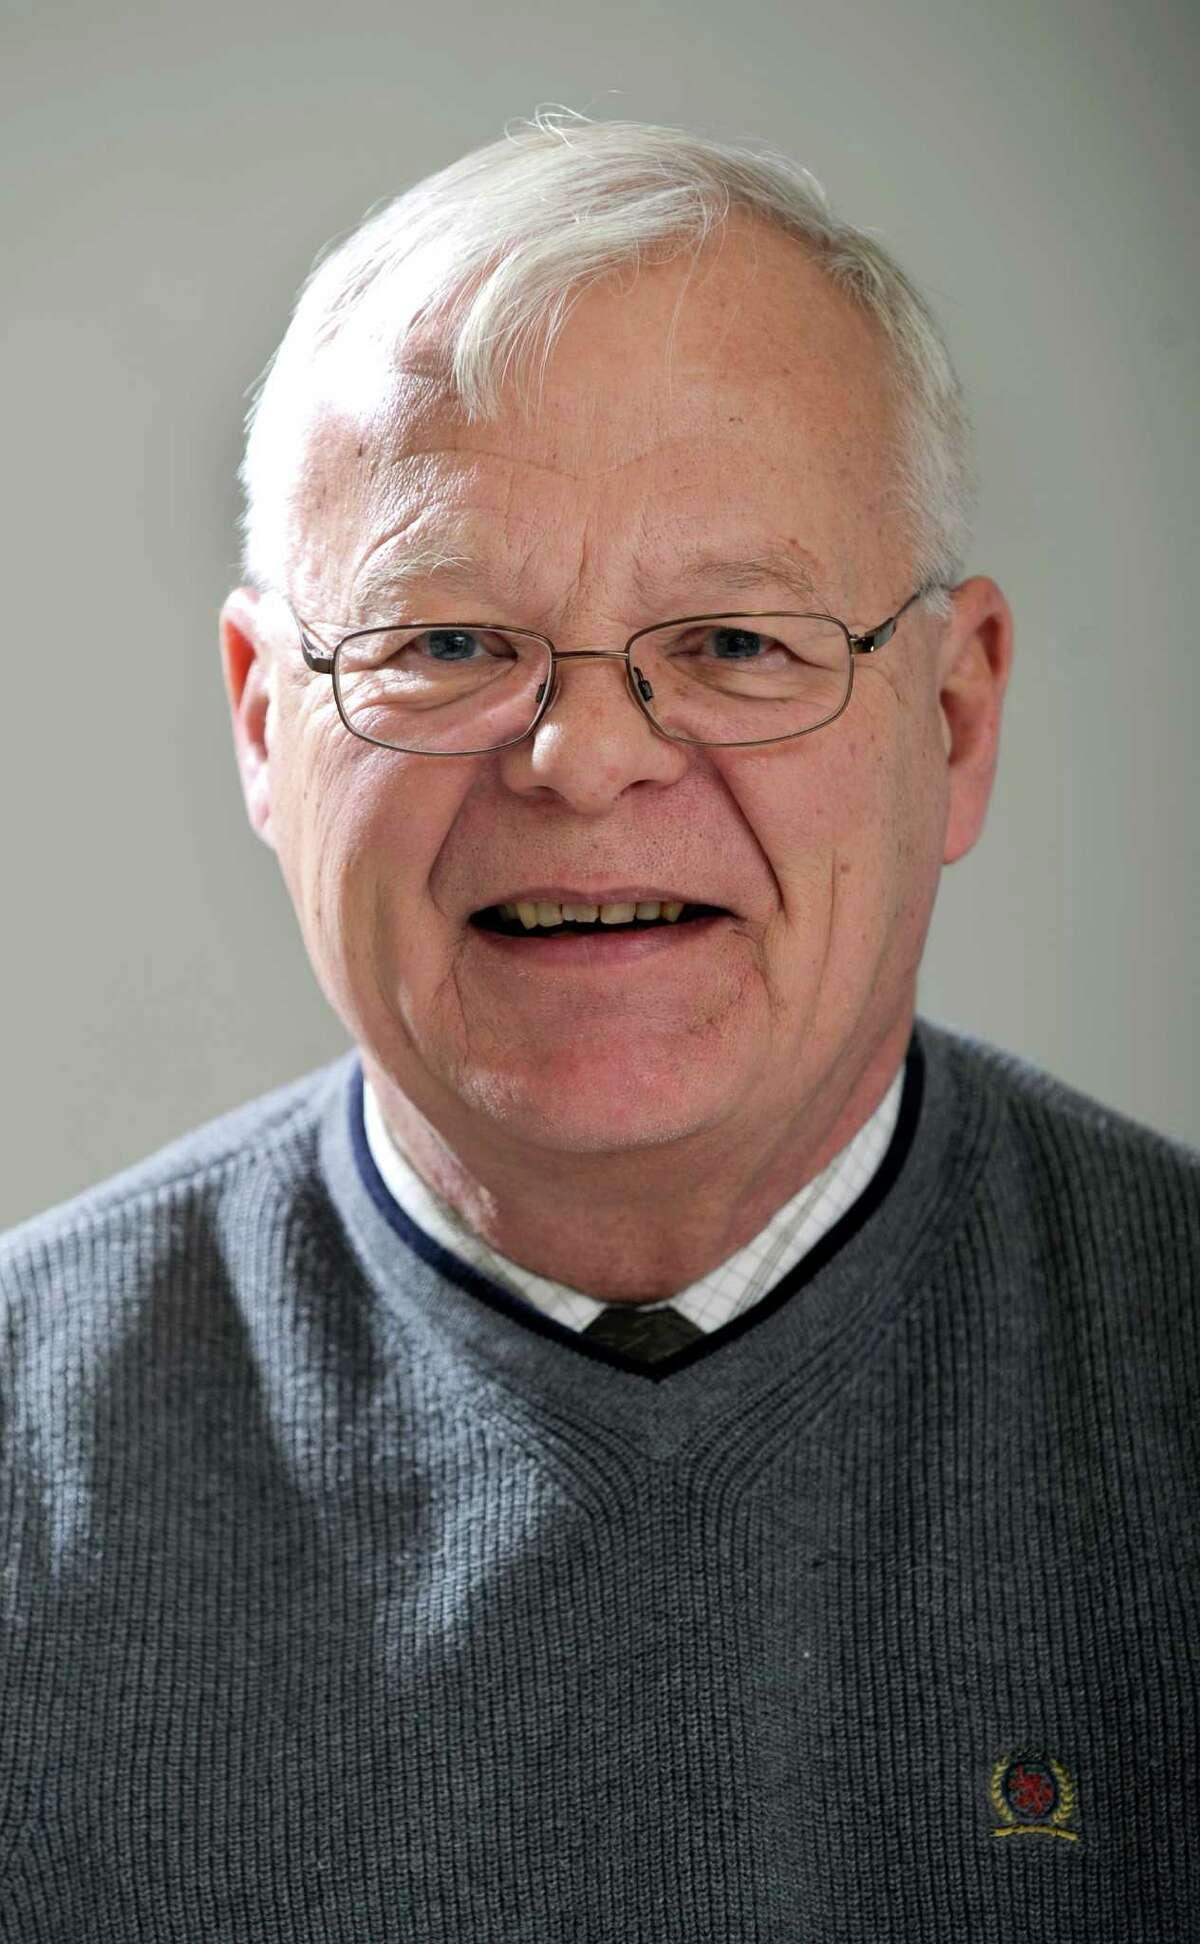 Bill Huegel, interim Pastorate Central Christian Church in Danbury, Conn.